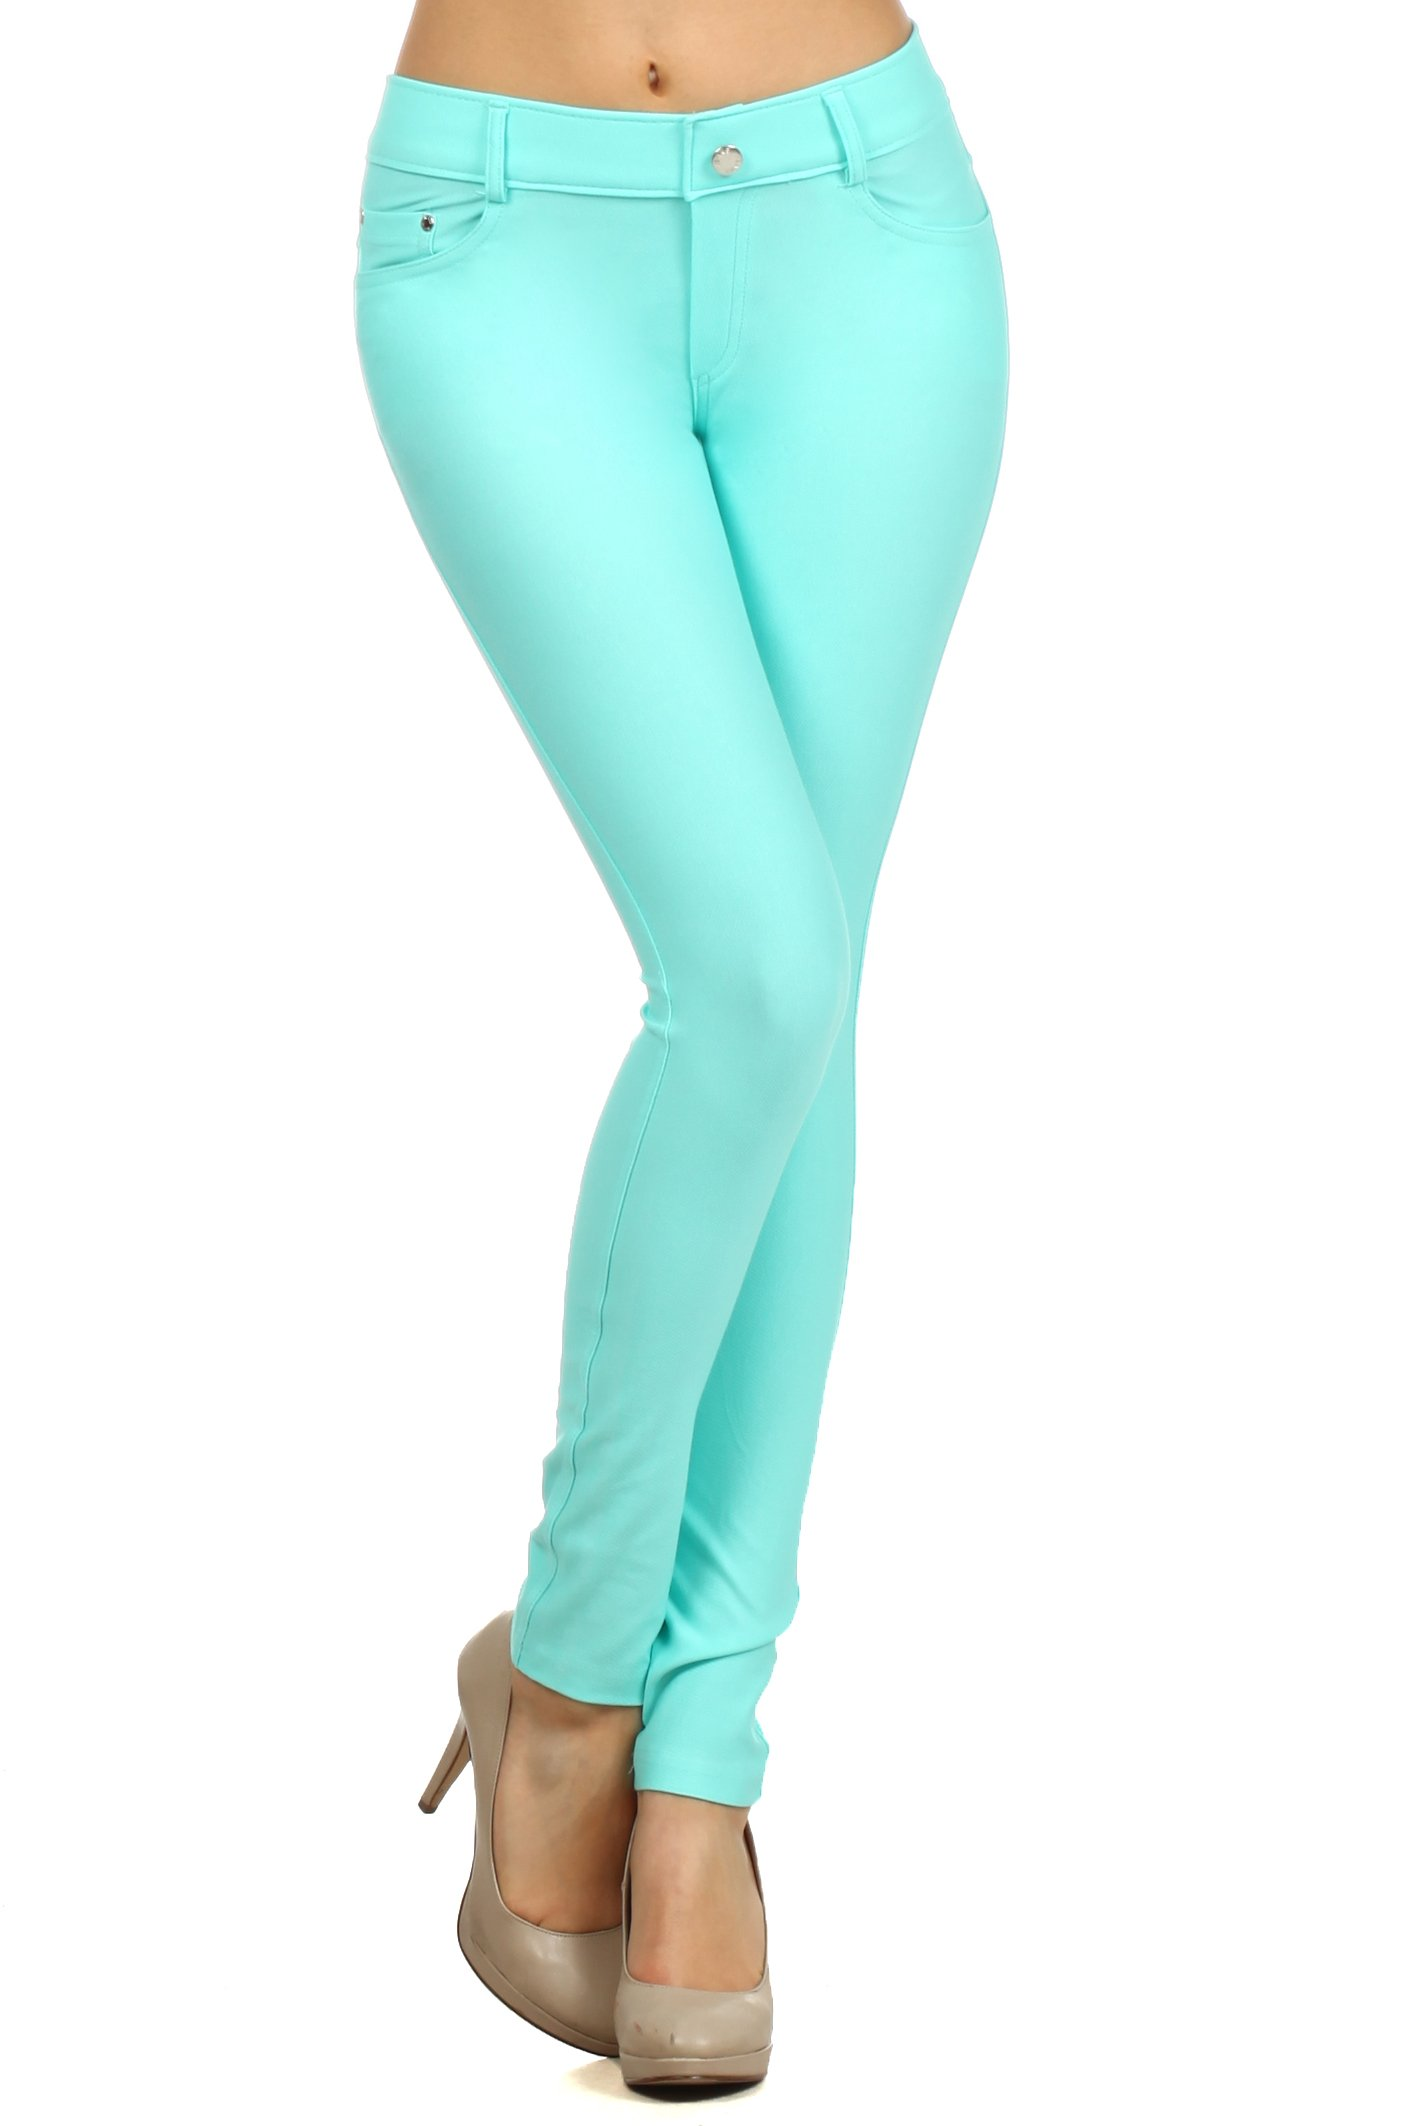 ICONOFLASH Women's Jeggings - Pull On Slimming Cotton Jean Like Leggings (Turquoise, Large)